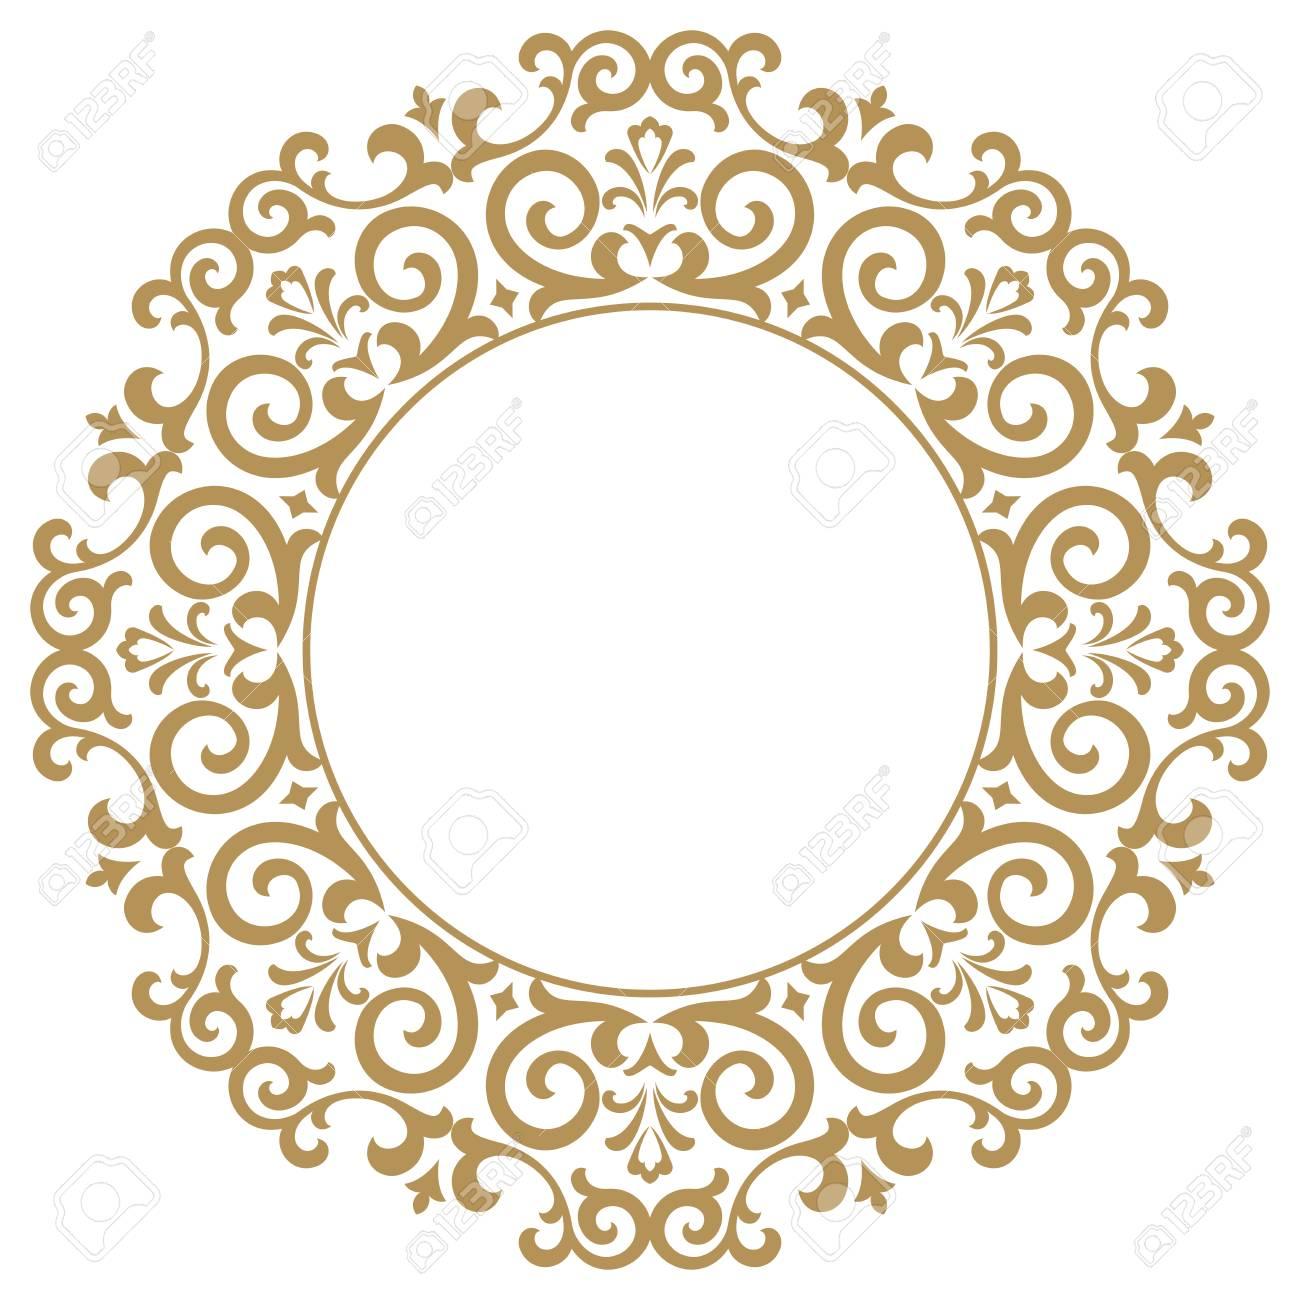 decorative frame elegant vector element for design in eastern rh 123rf com lace border vector png black lace border vector